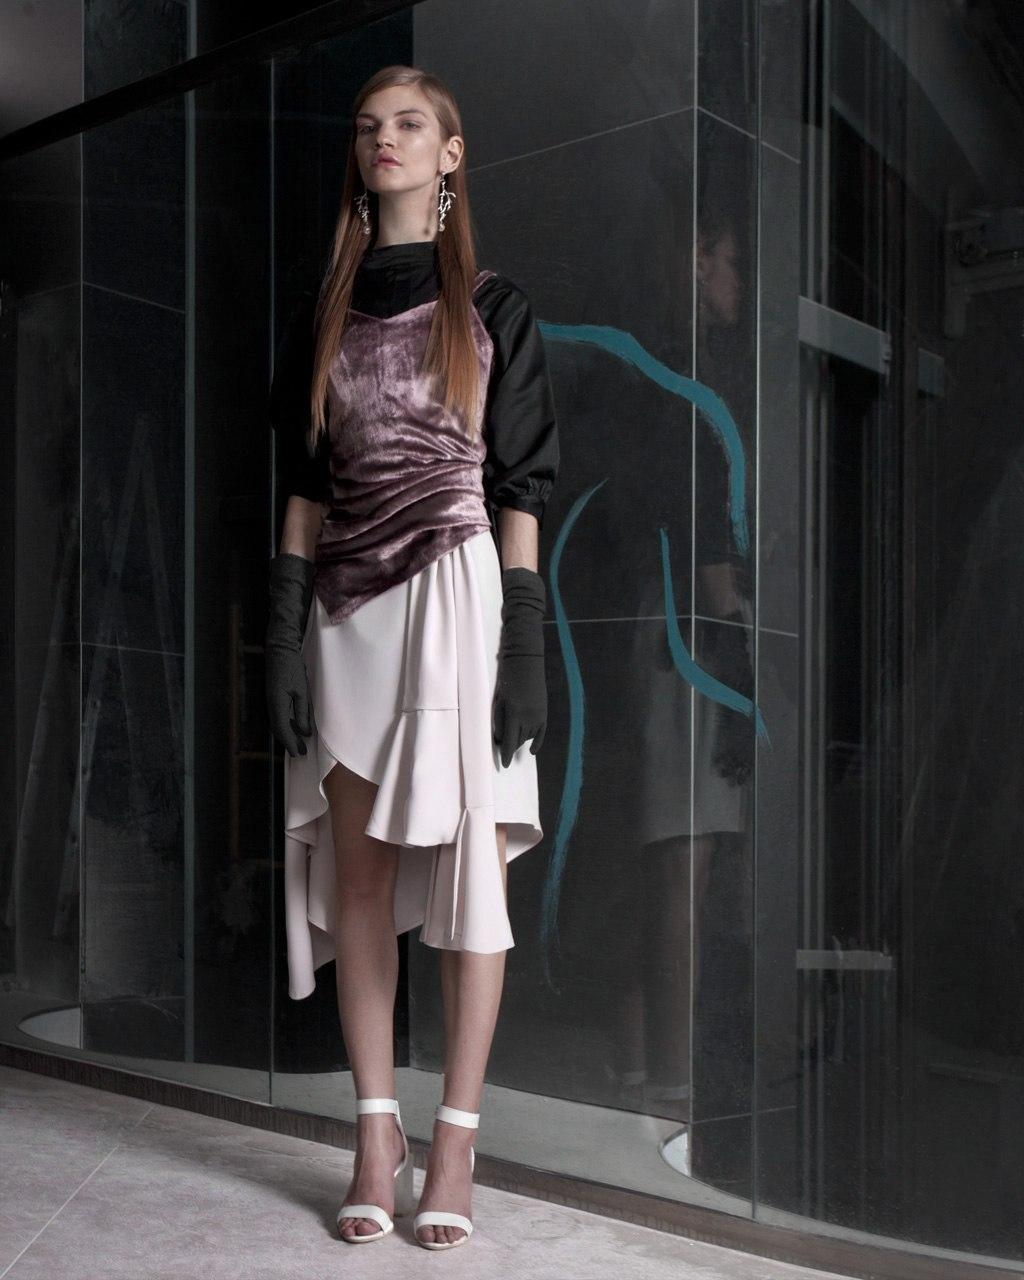 Photography Zhanna Zankova - fashion - fashionphotography   ello